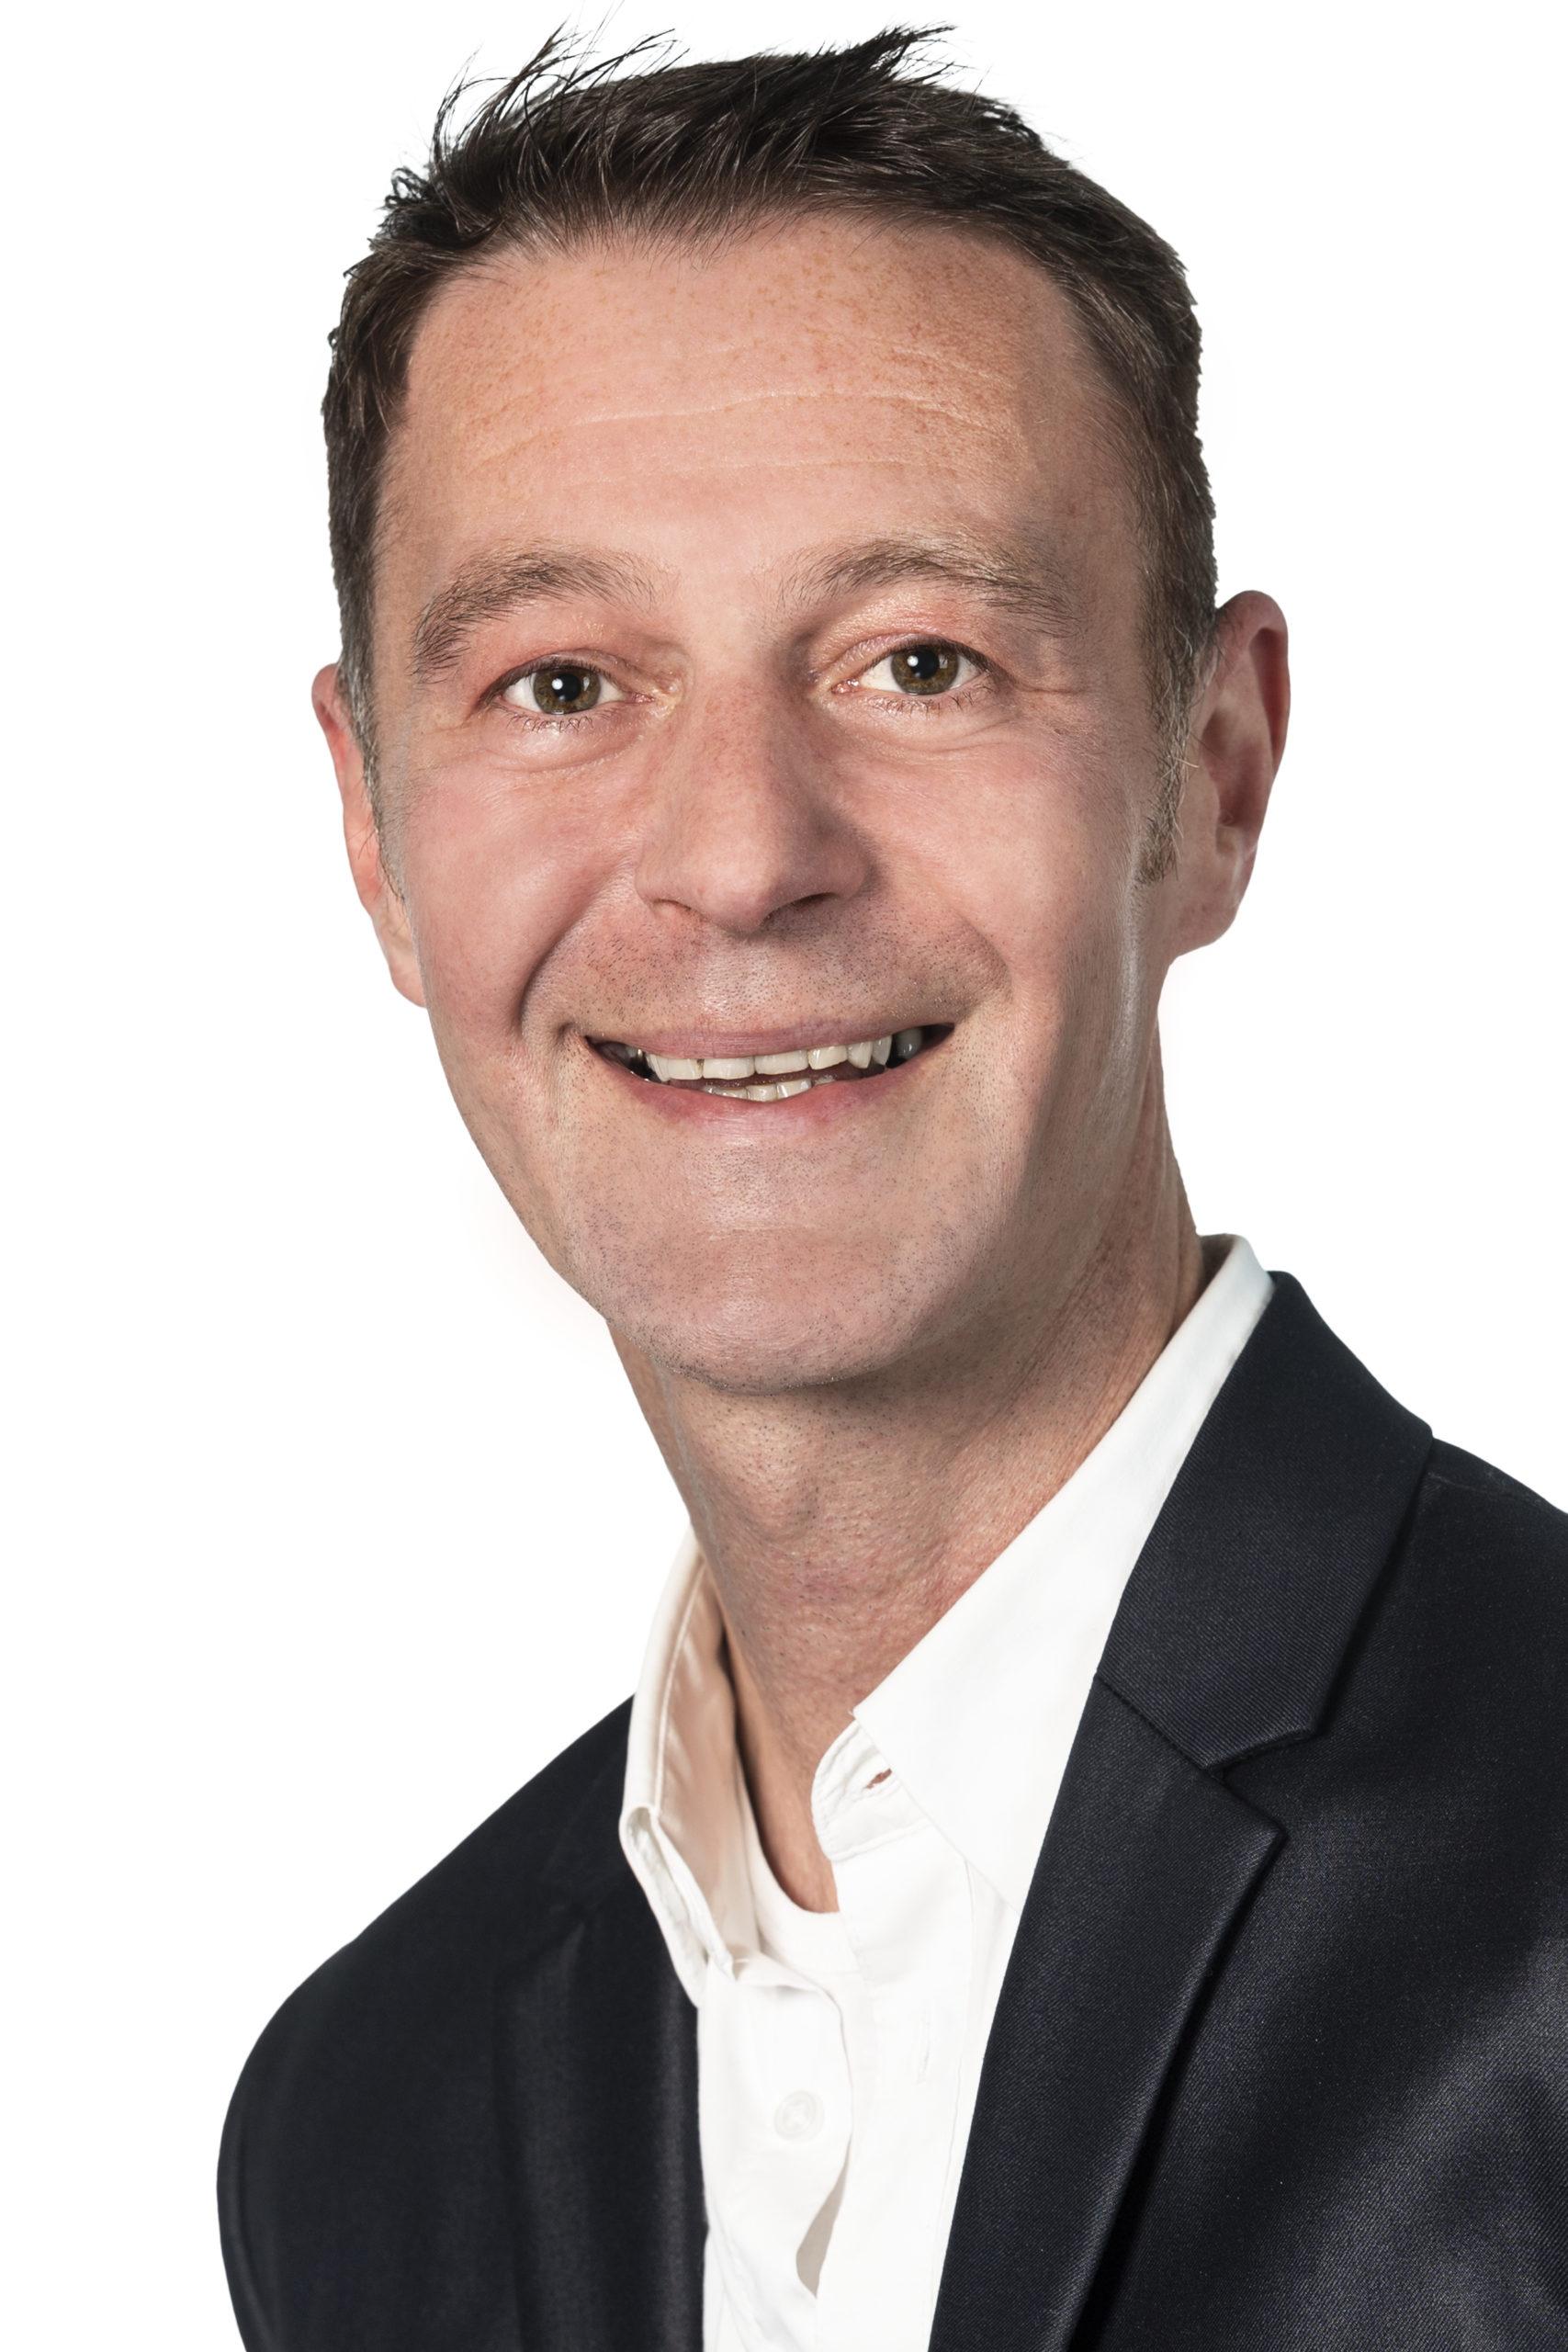 Michael Chladek